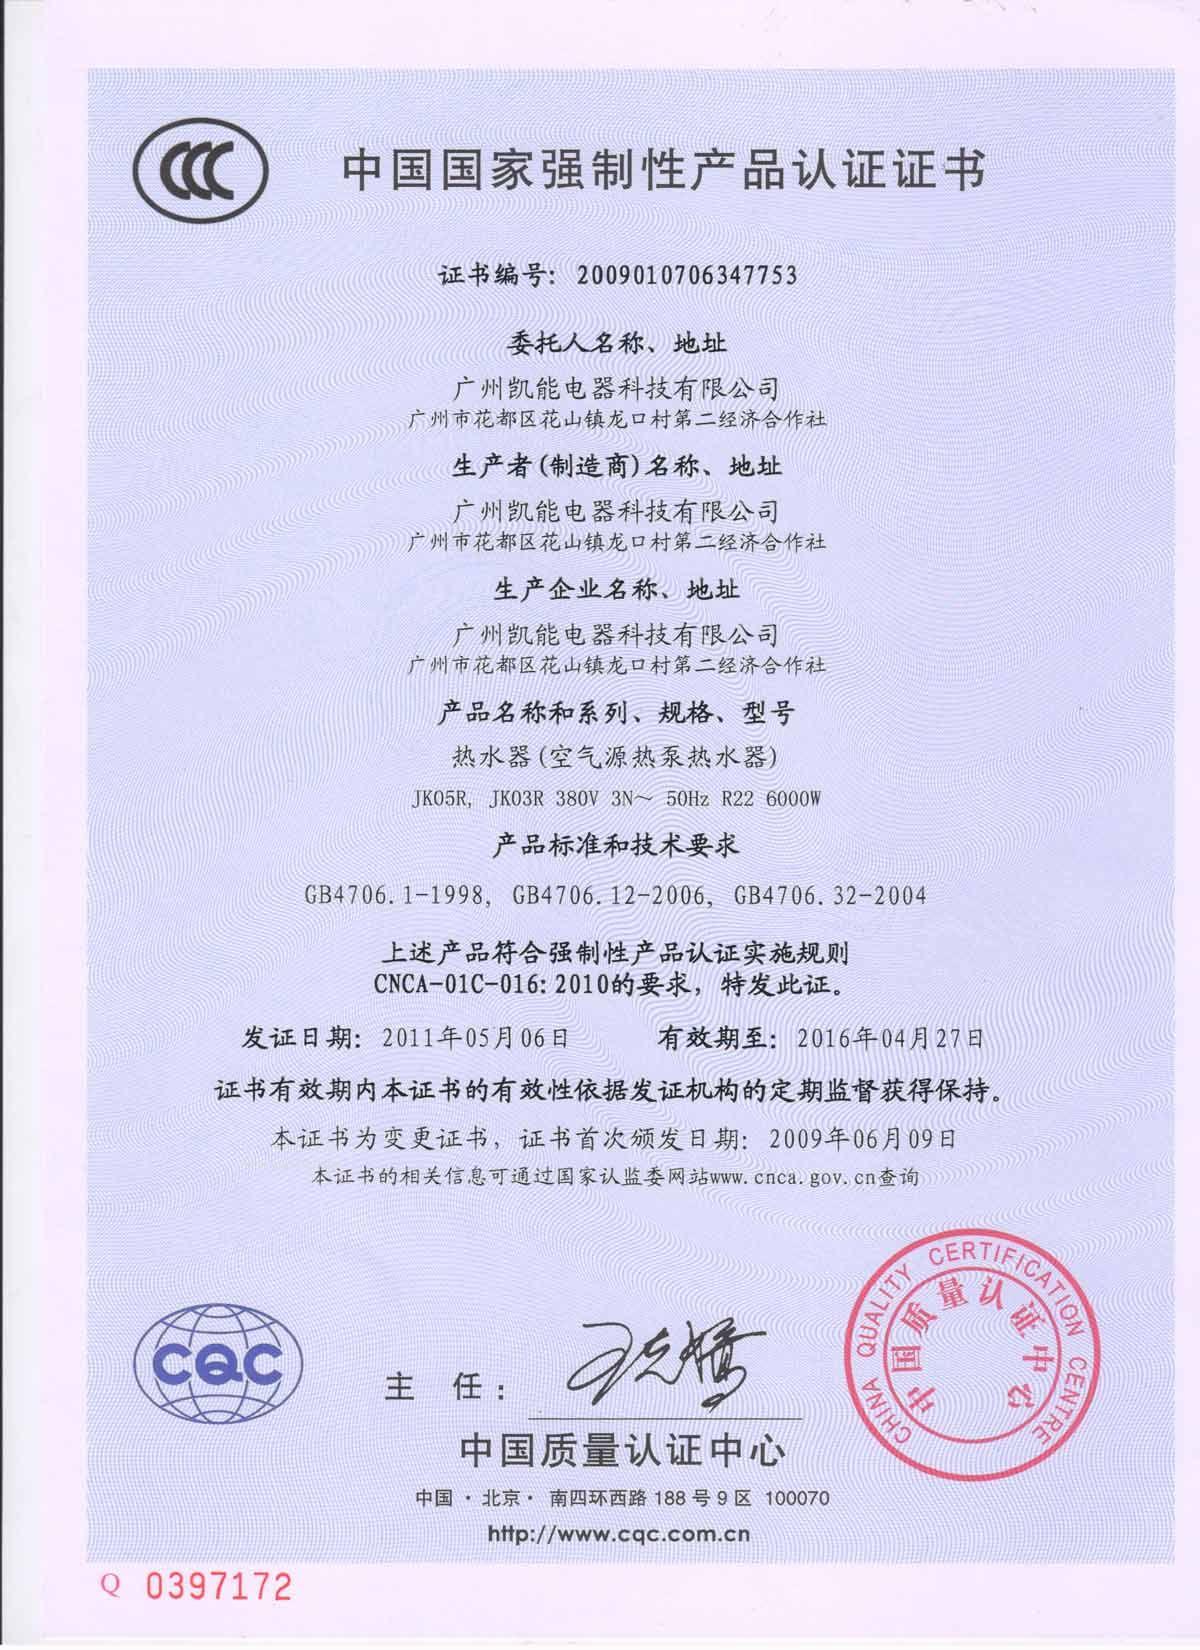 China Compulsory Certification Certificate | Uni-World Services CO.LTD